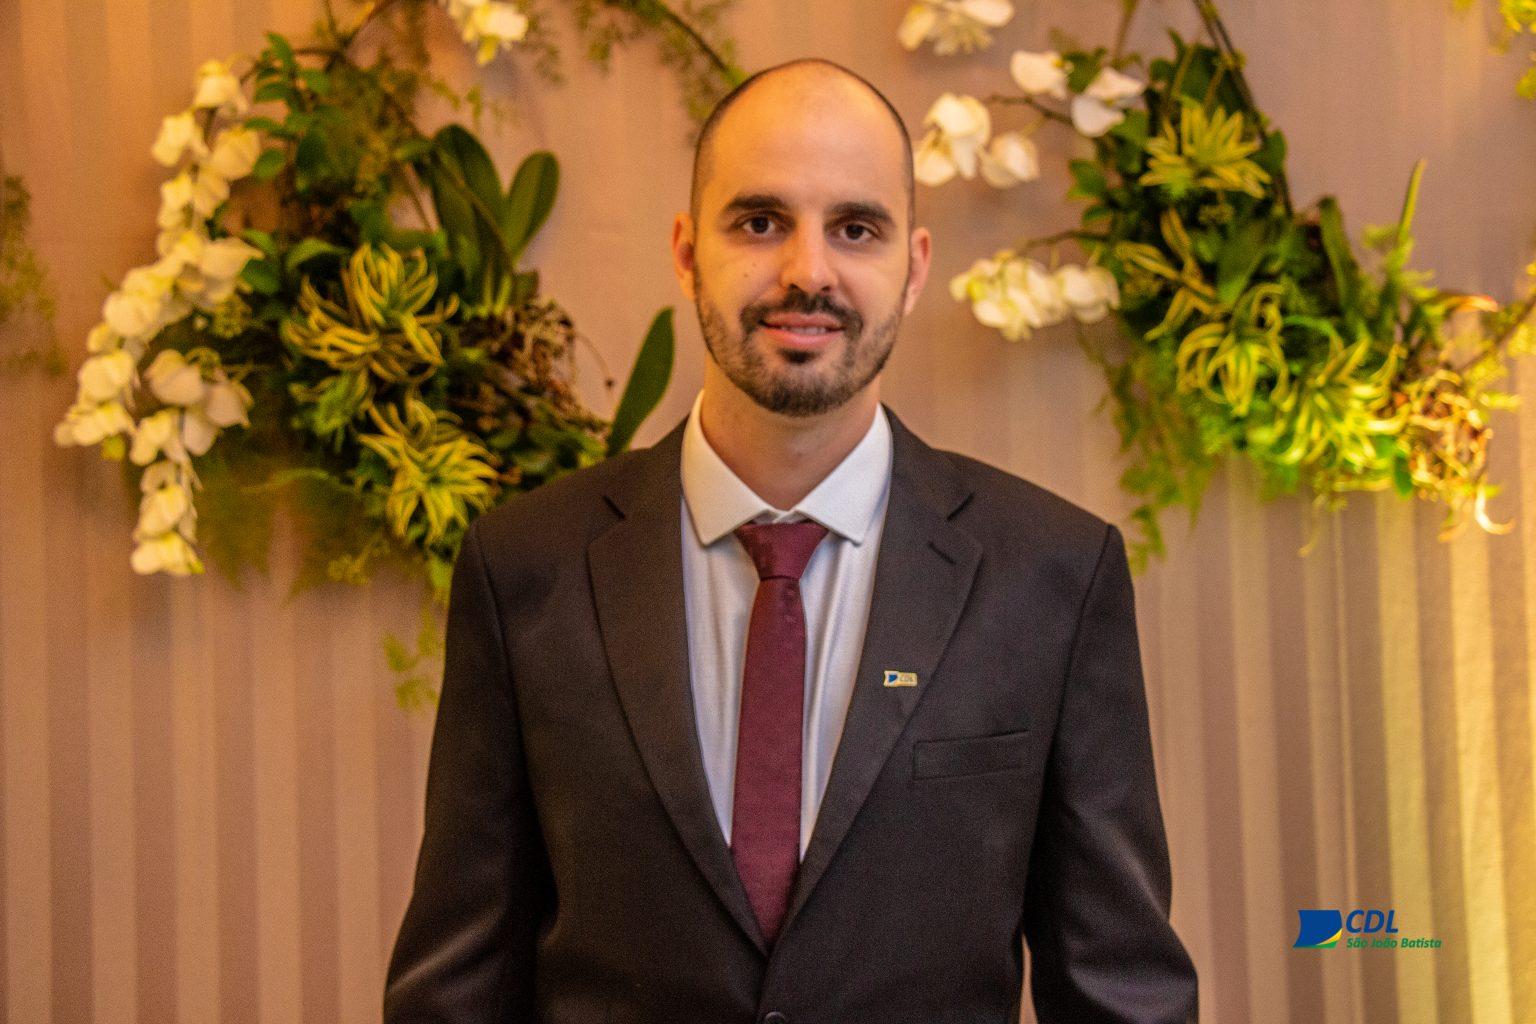 Felipe Dandoline